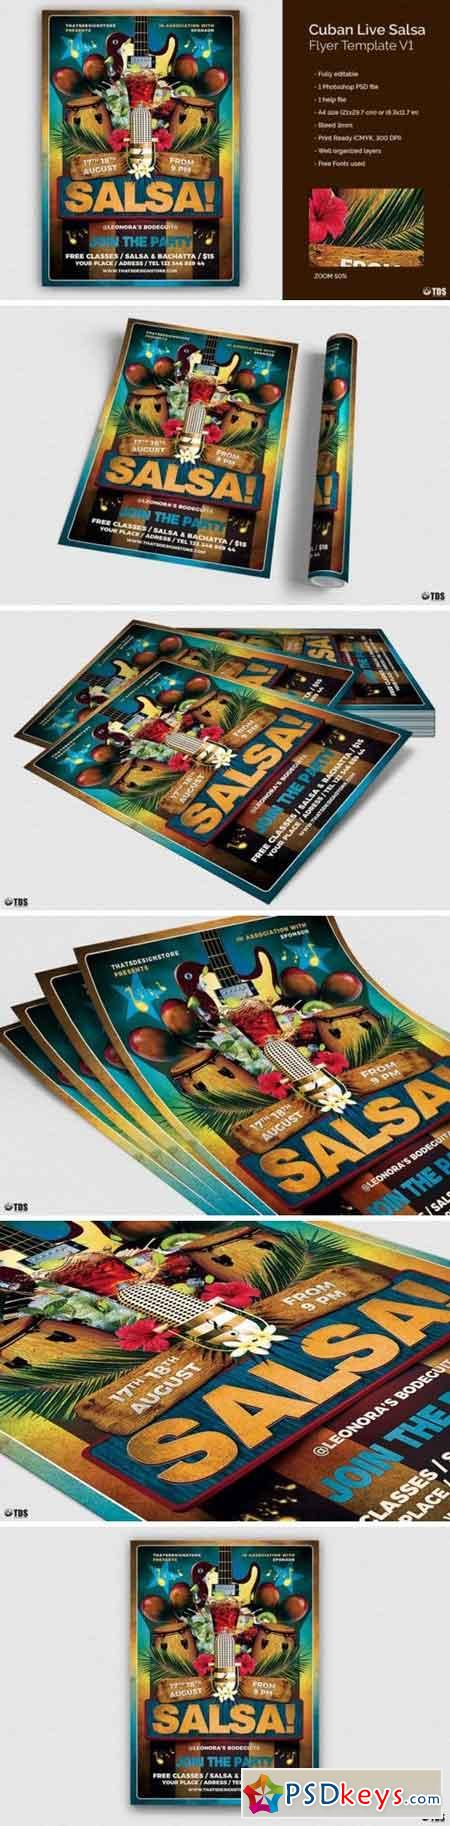 Cuban Live Salsa Flyer Template V1 89143